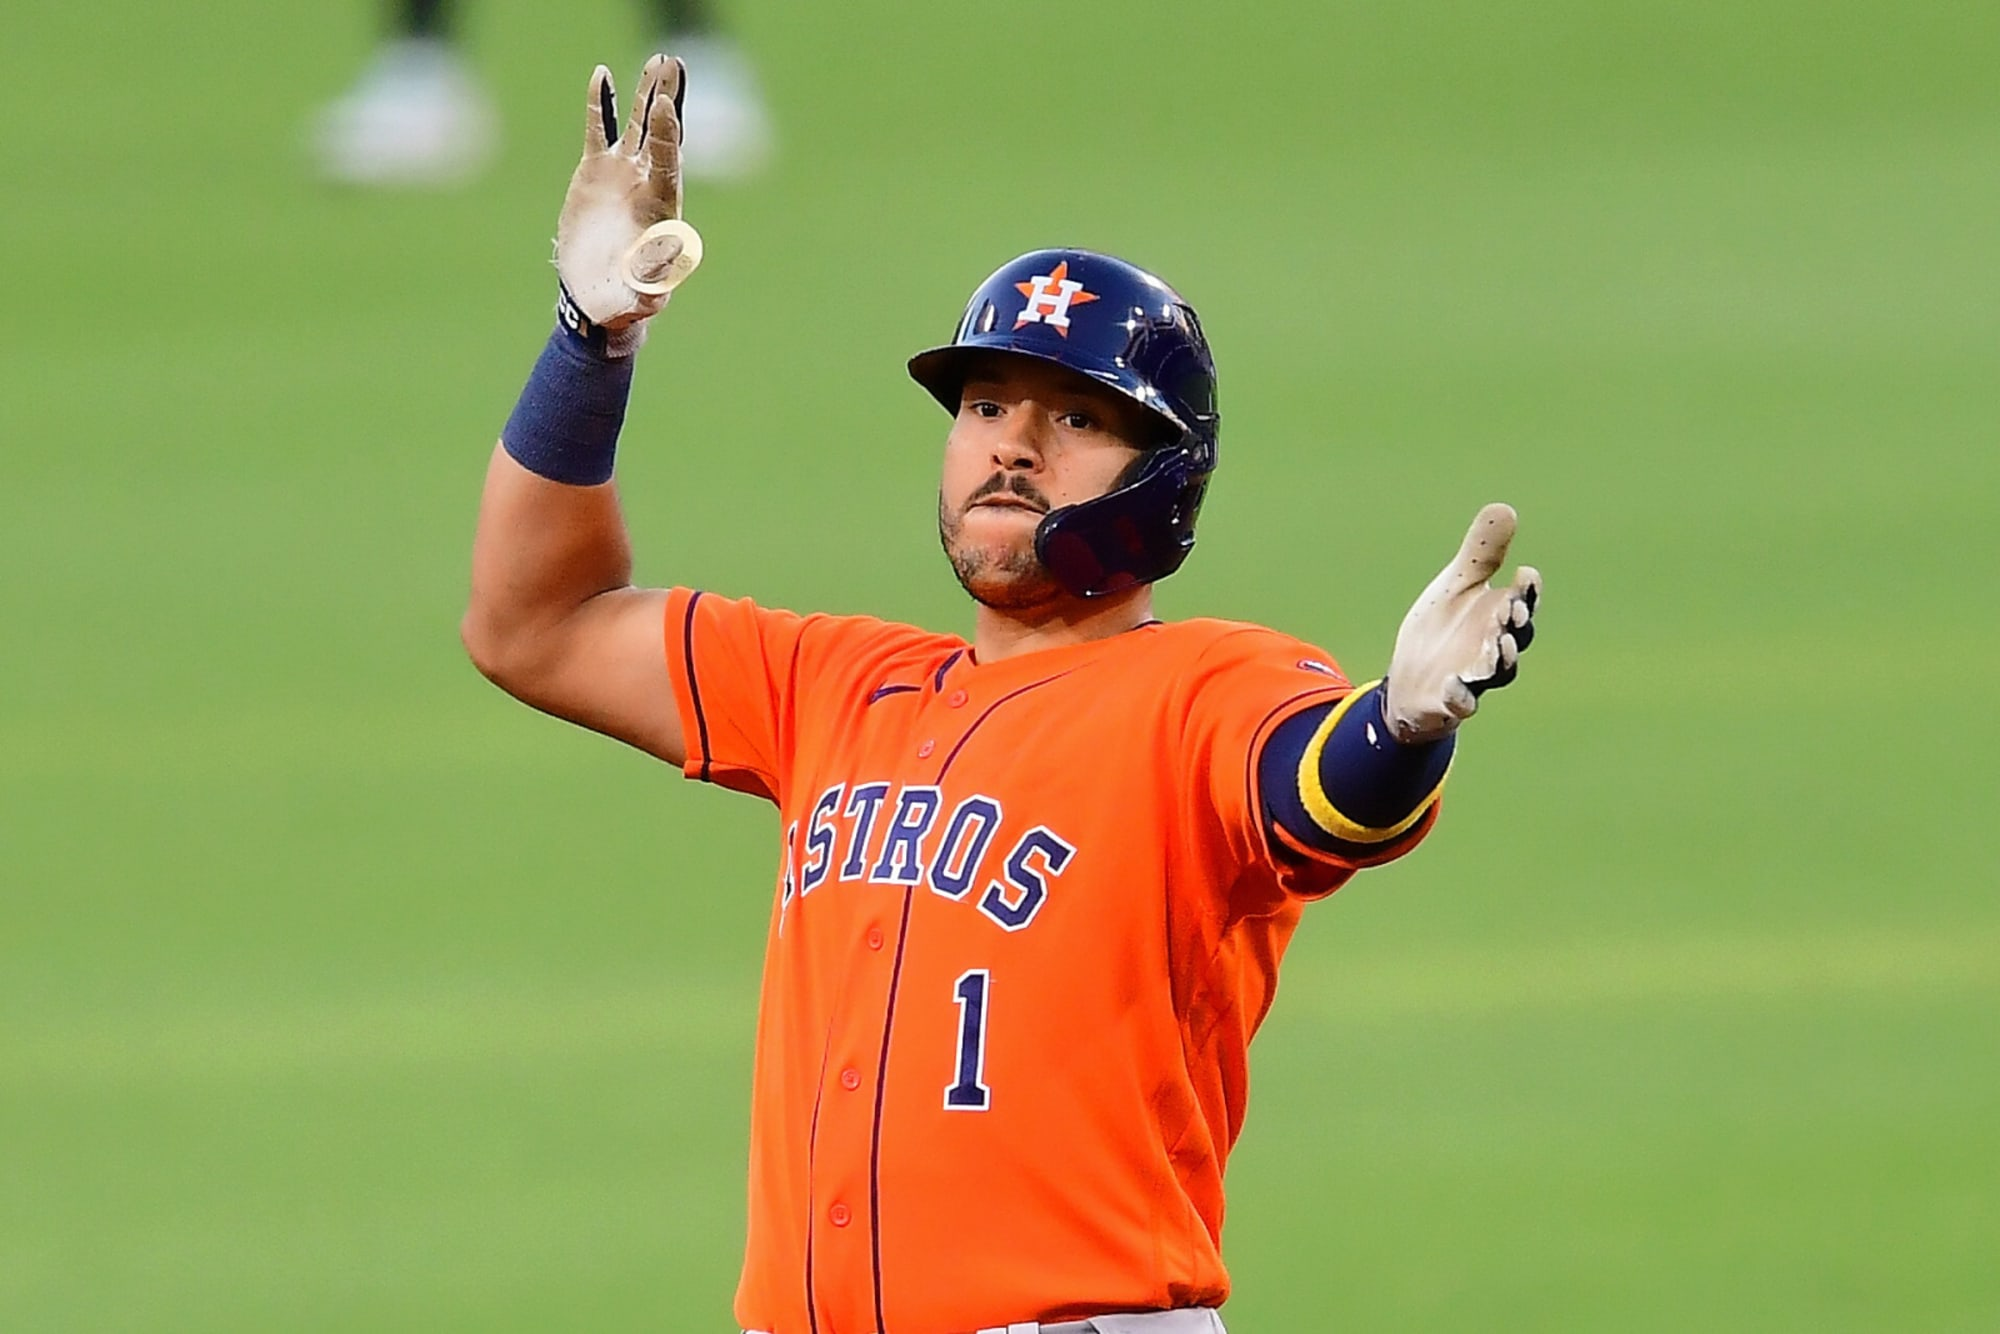 Carlos Correa Houston Astros Spring Training Baseball Player Jersey